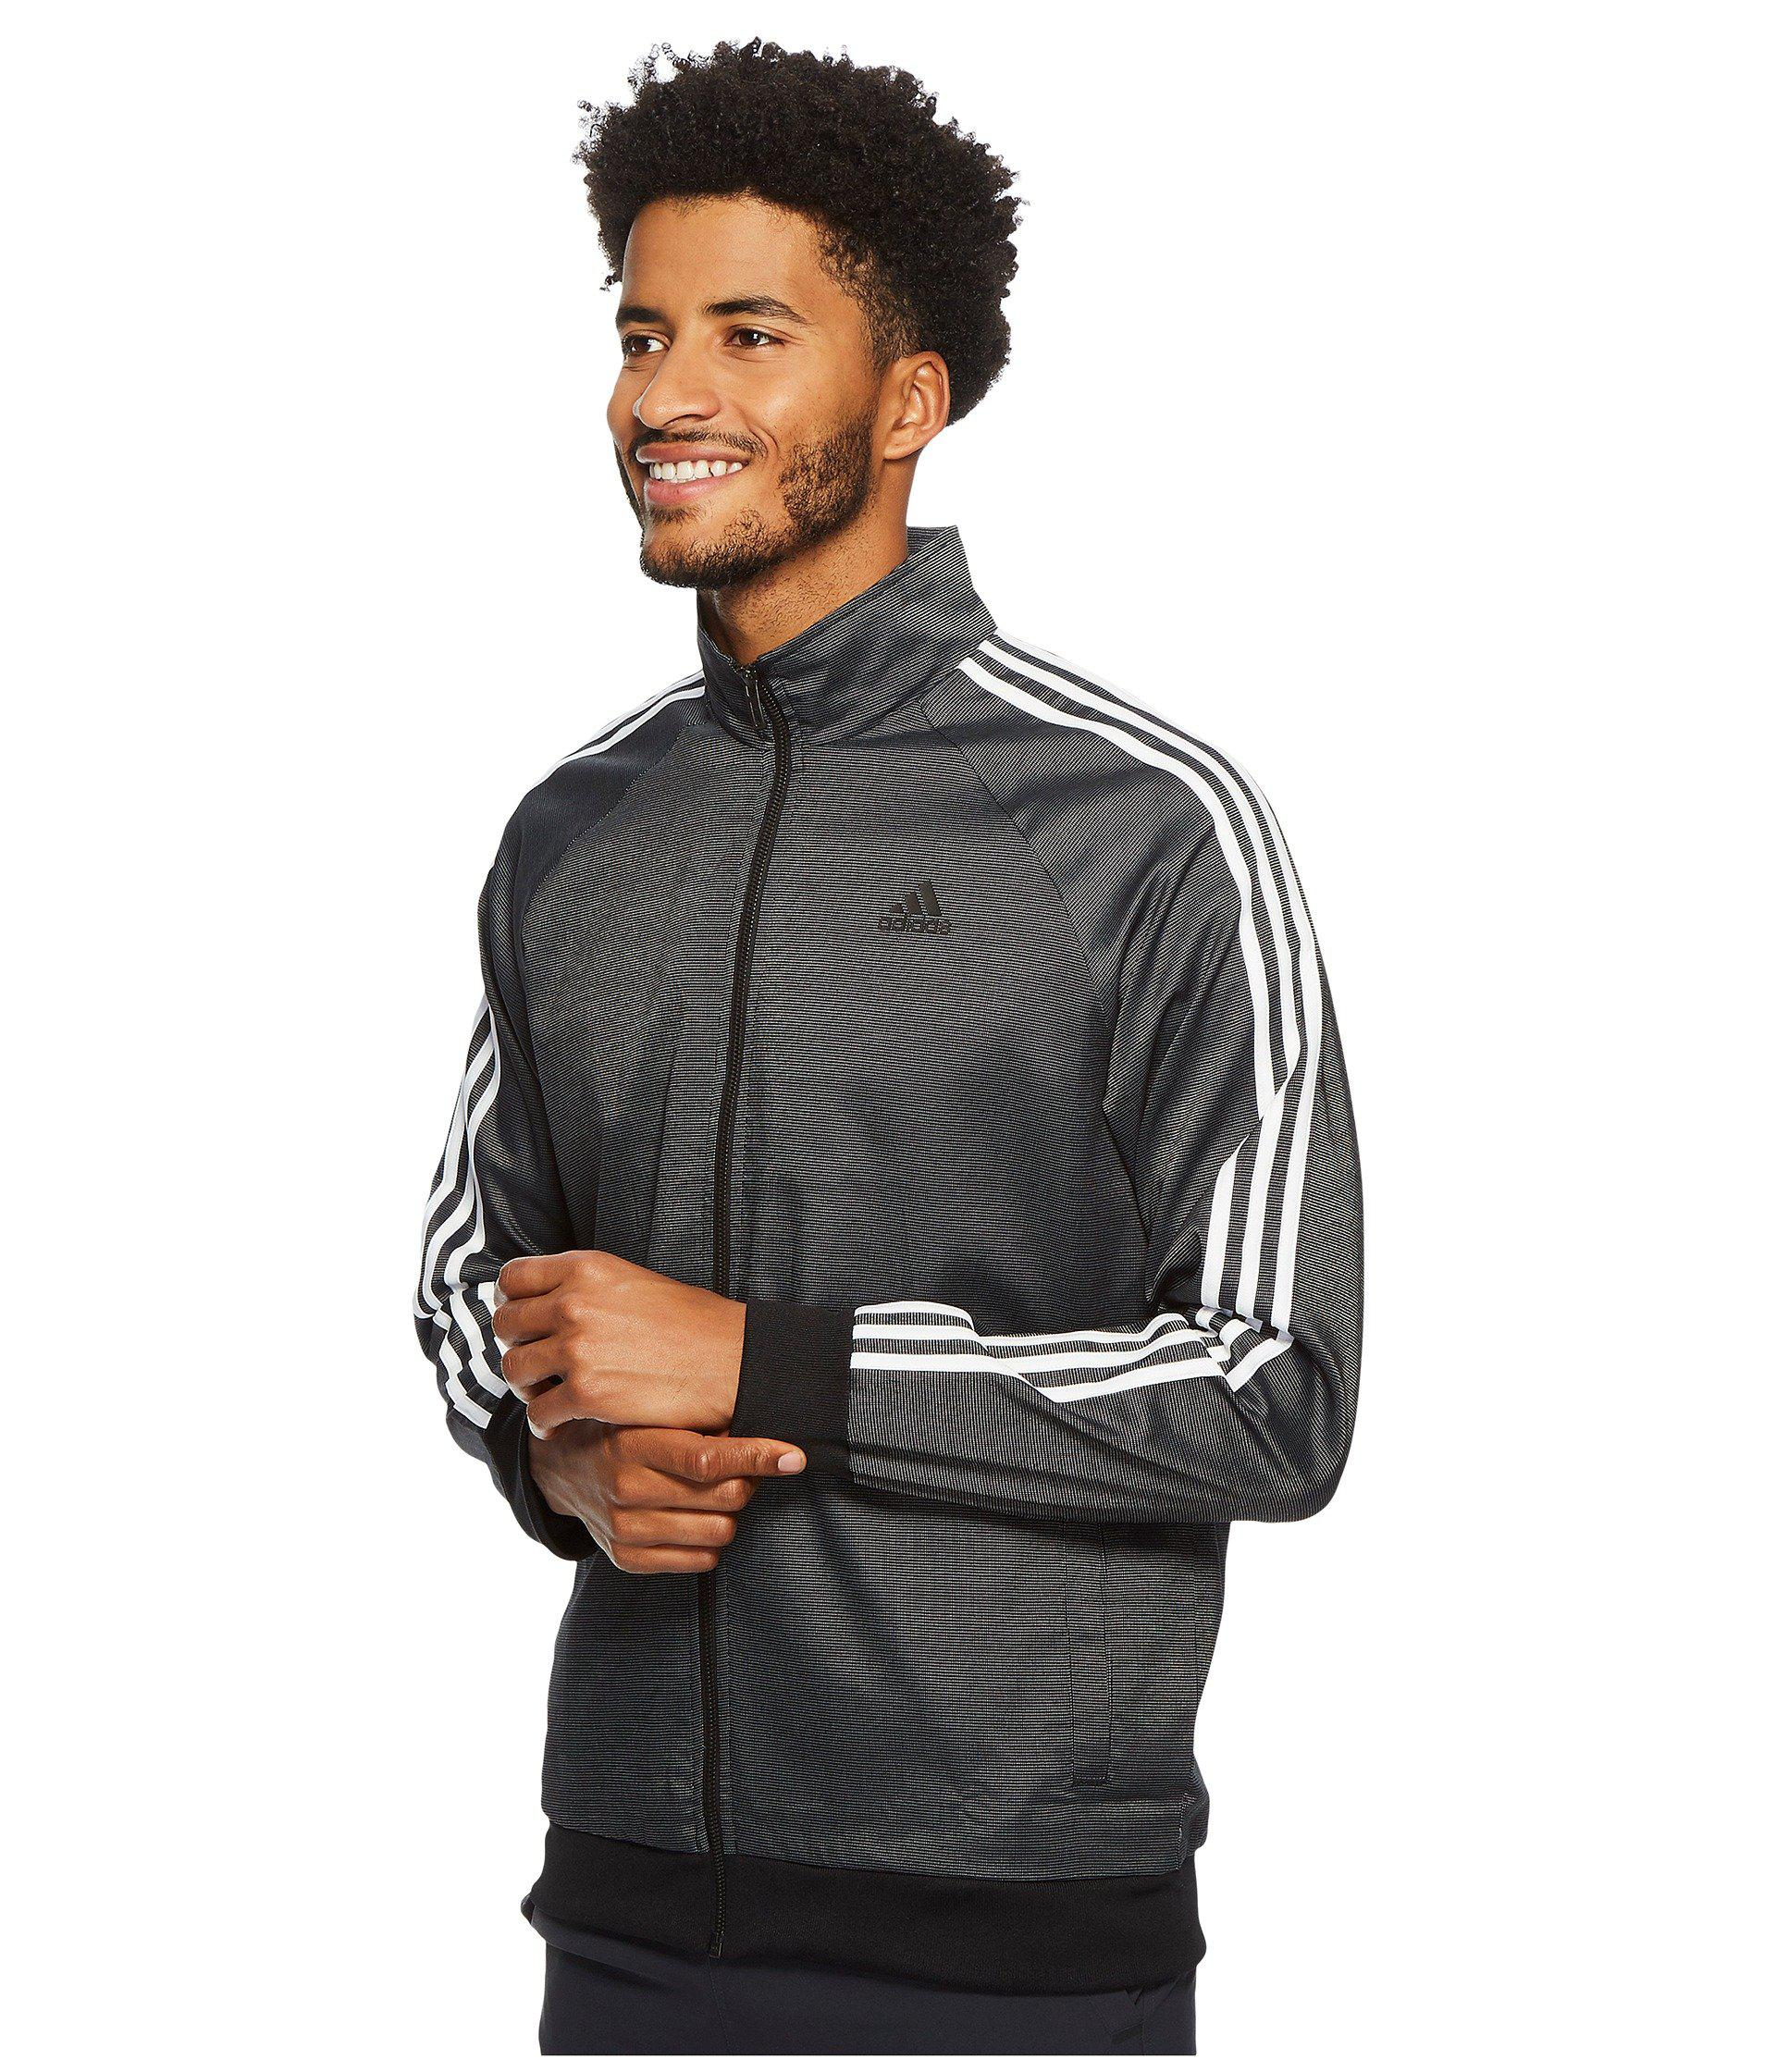 6fa39c8ff018 Lyst - adidas Essentials 3-stripe Woven Track Top in Black for Men